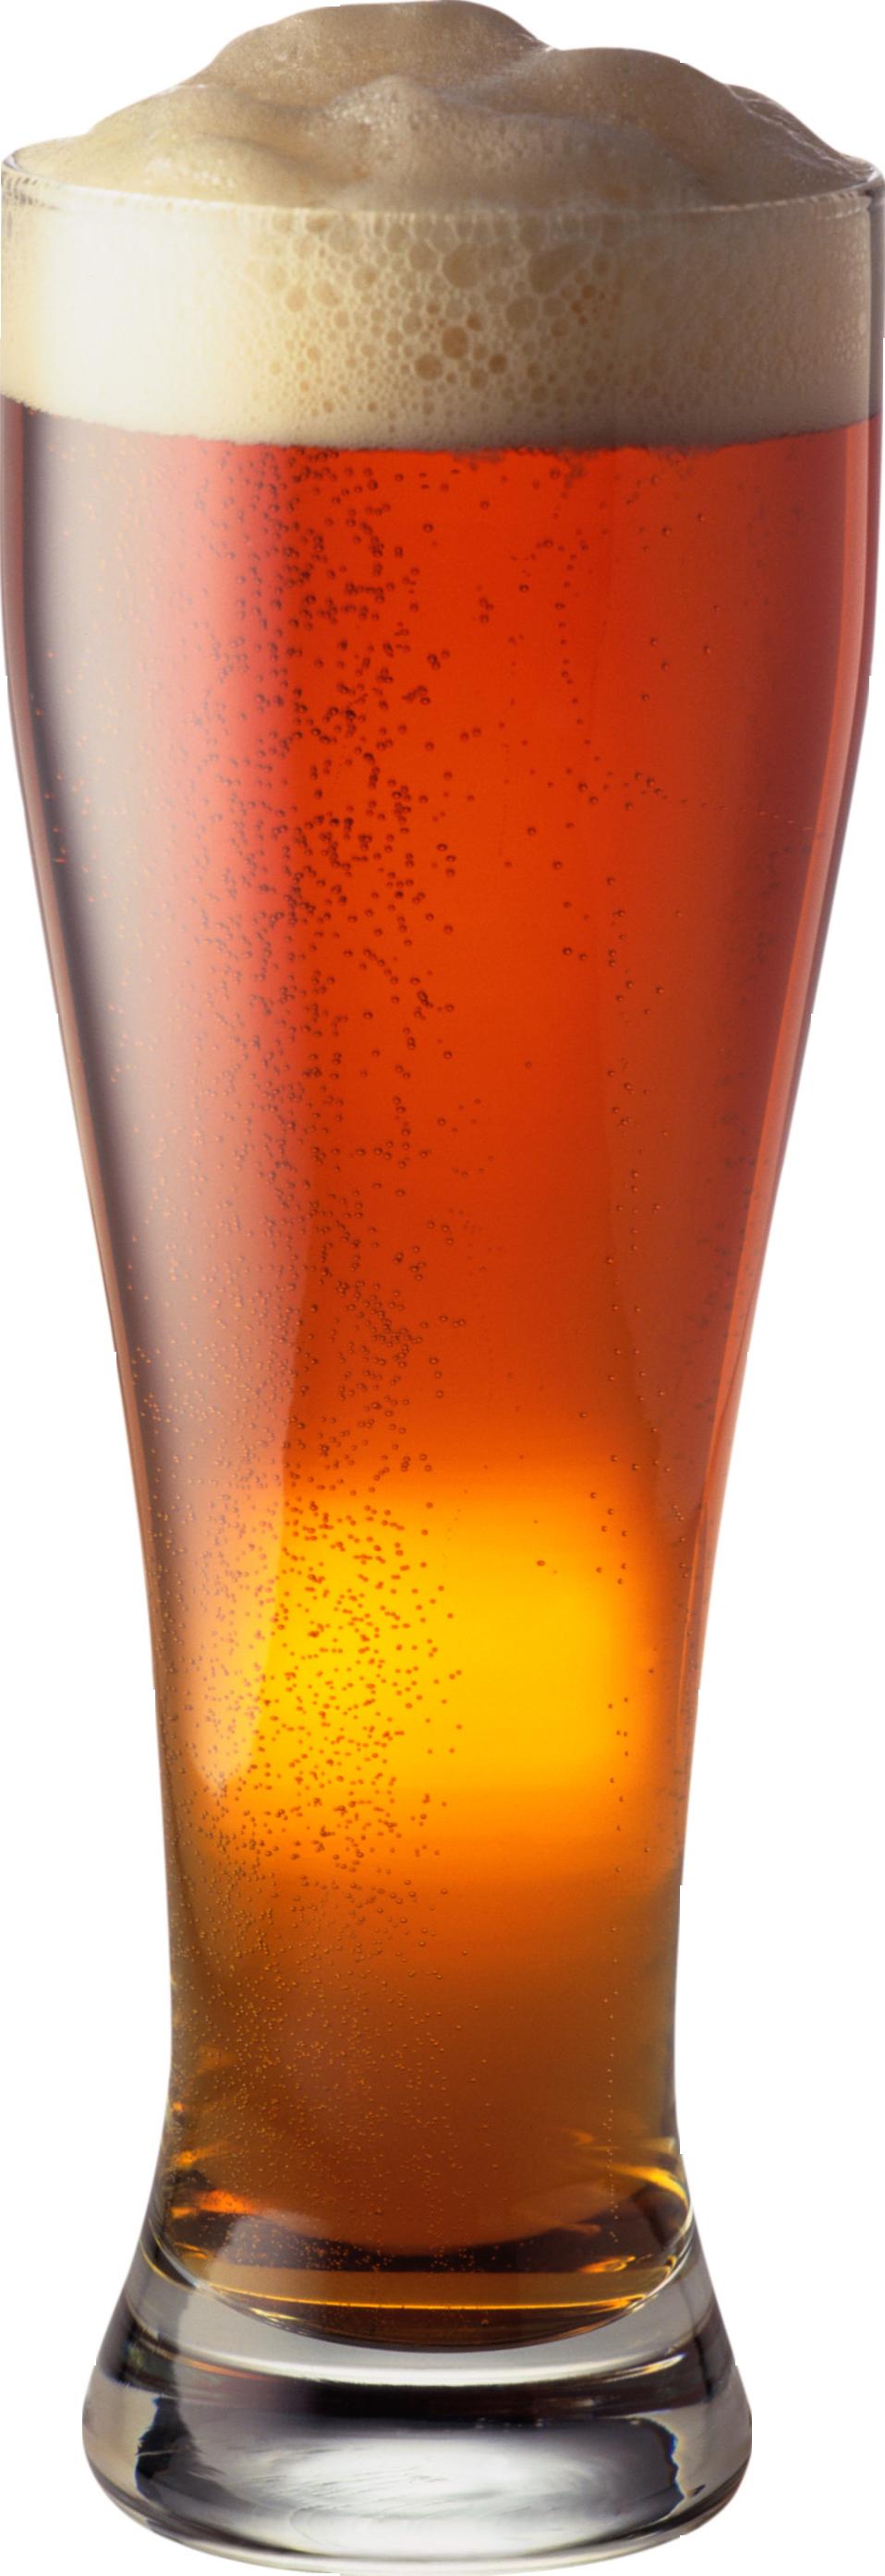 Пиво стакан PNG фото